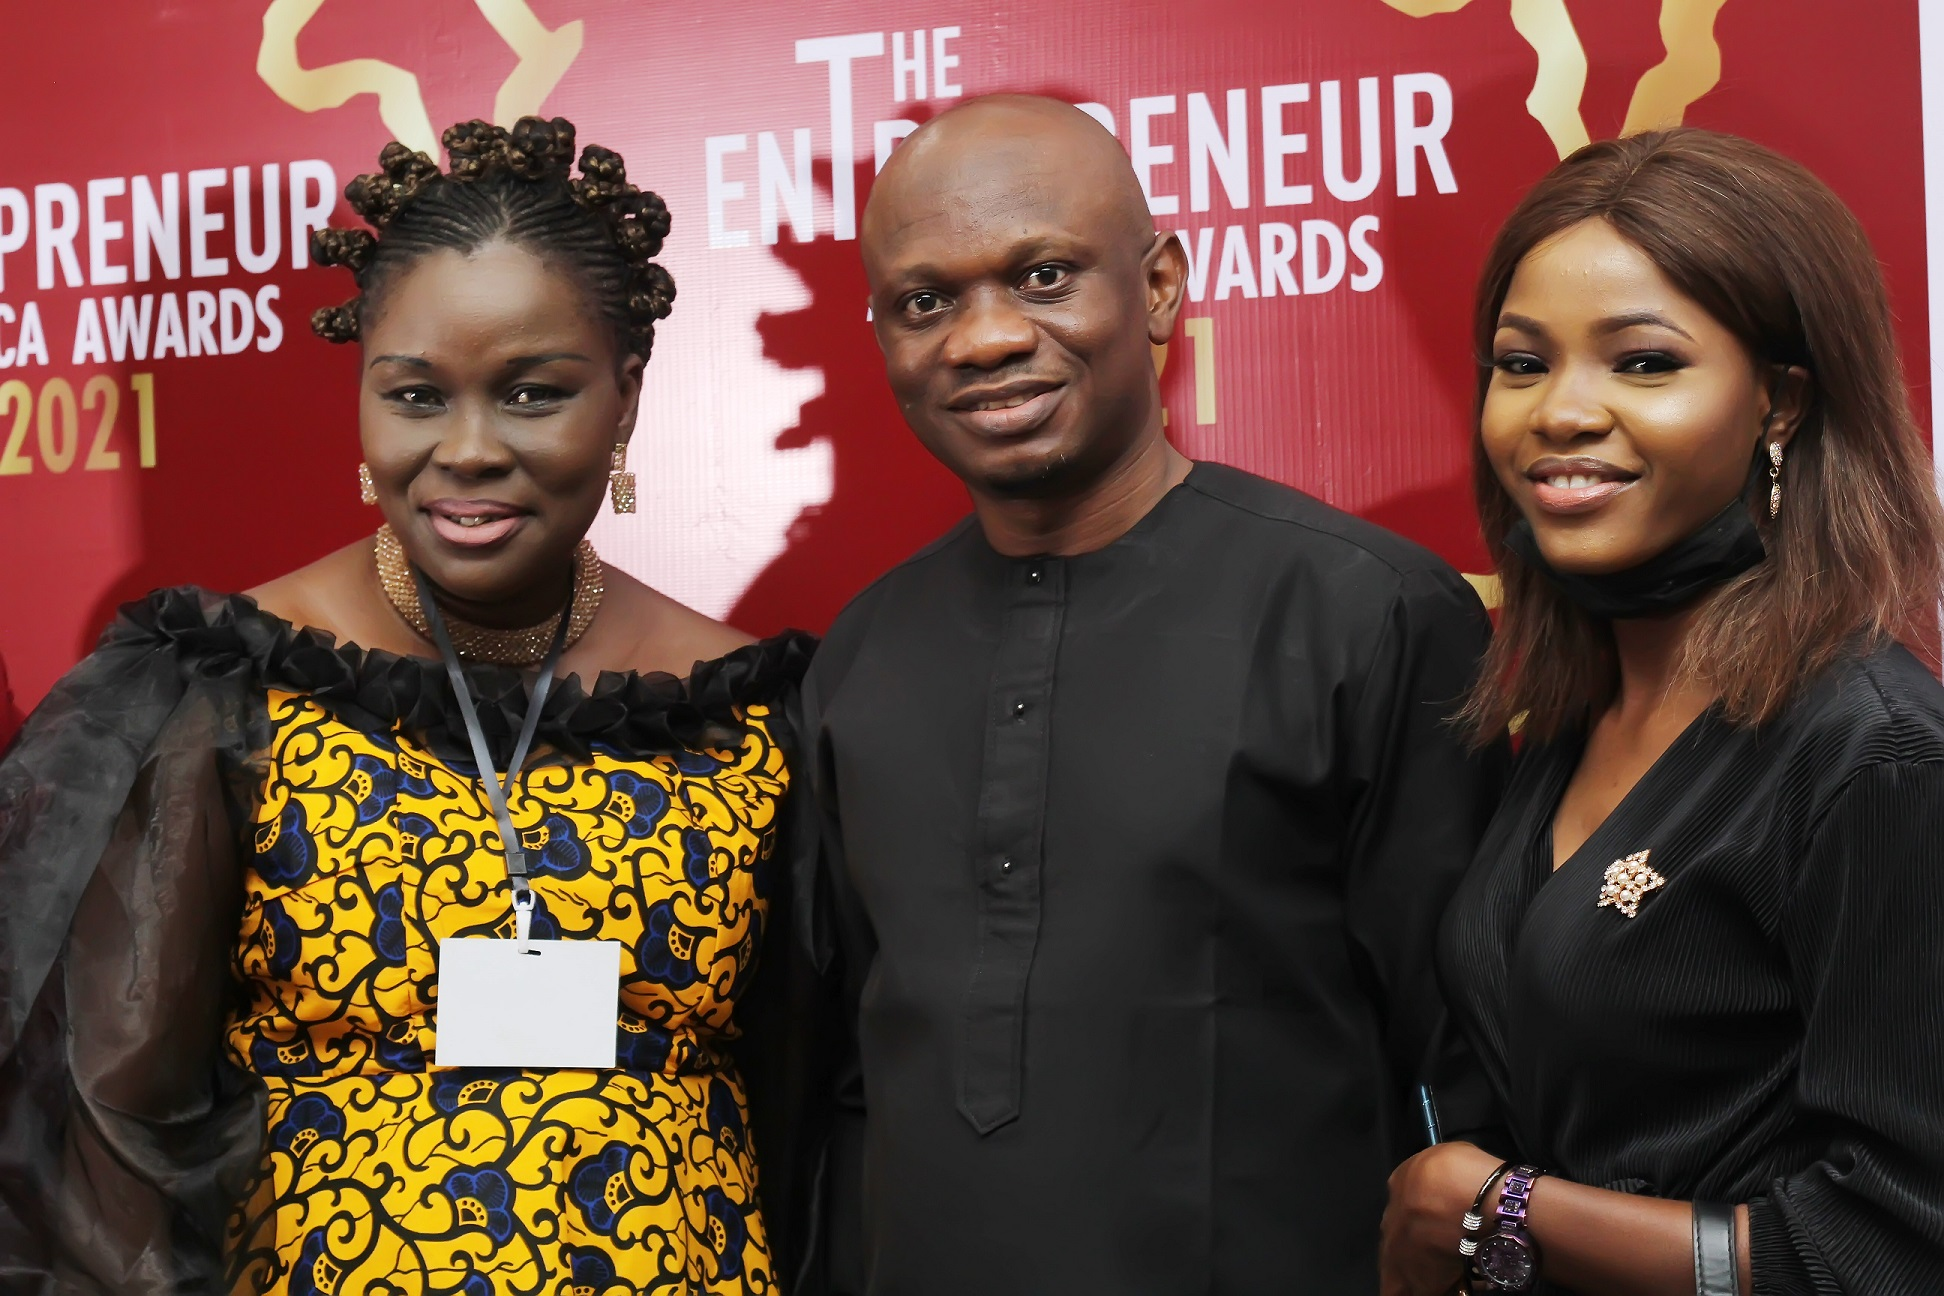 :L-R Temitope Akeju, CEO, Decortales, Seye Olurotimi, Founder, MSME Africa and Mercy Alao, Community Manager,MSME Africa at the Entrepreneurs Africa Awards 2021